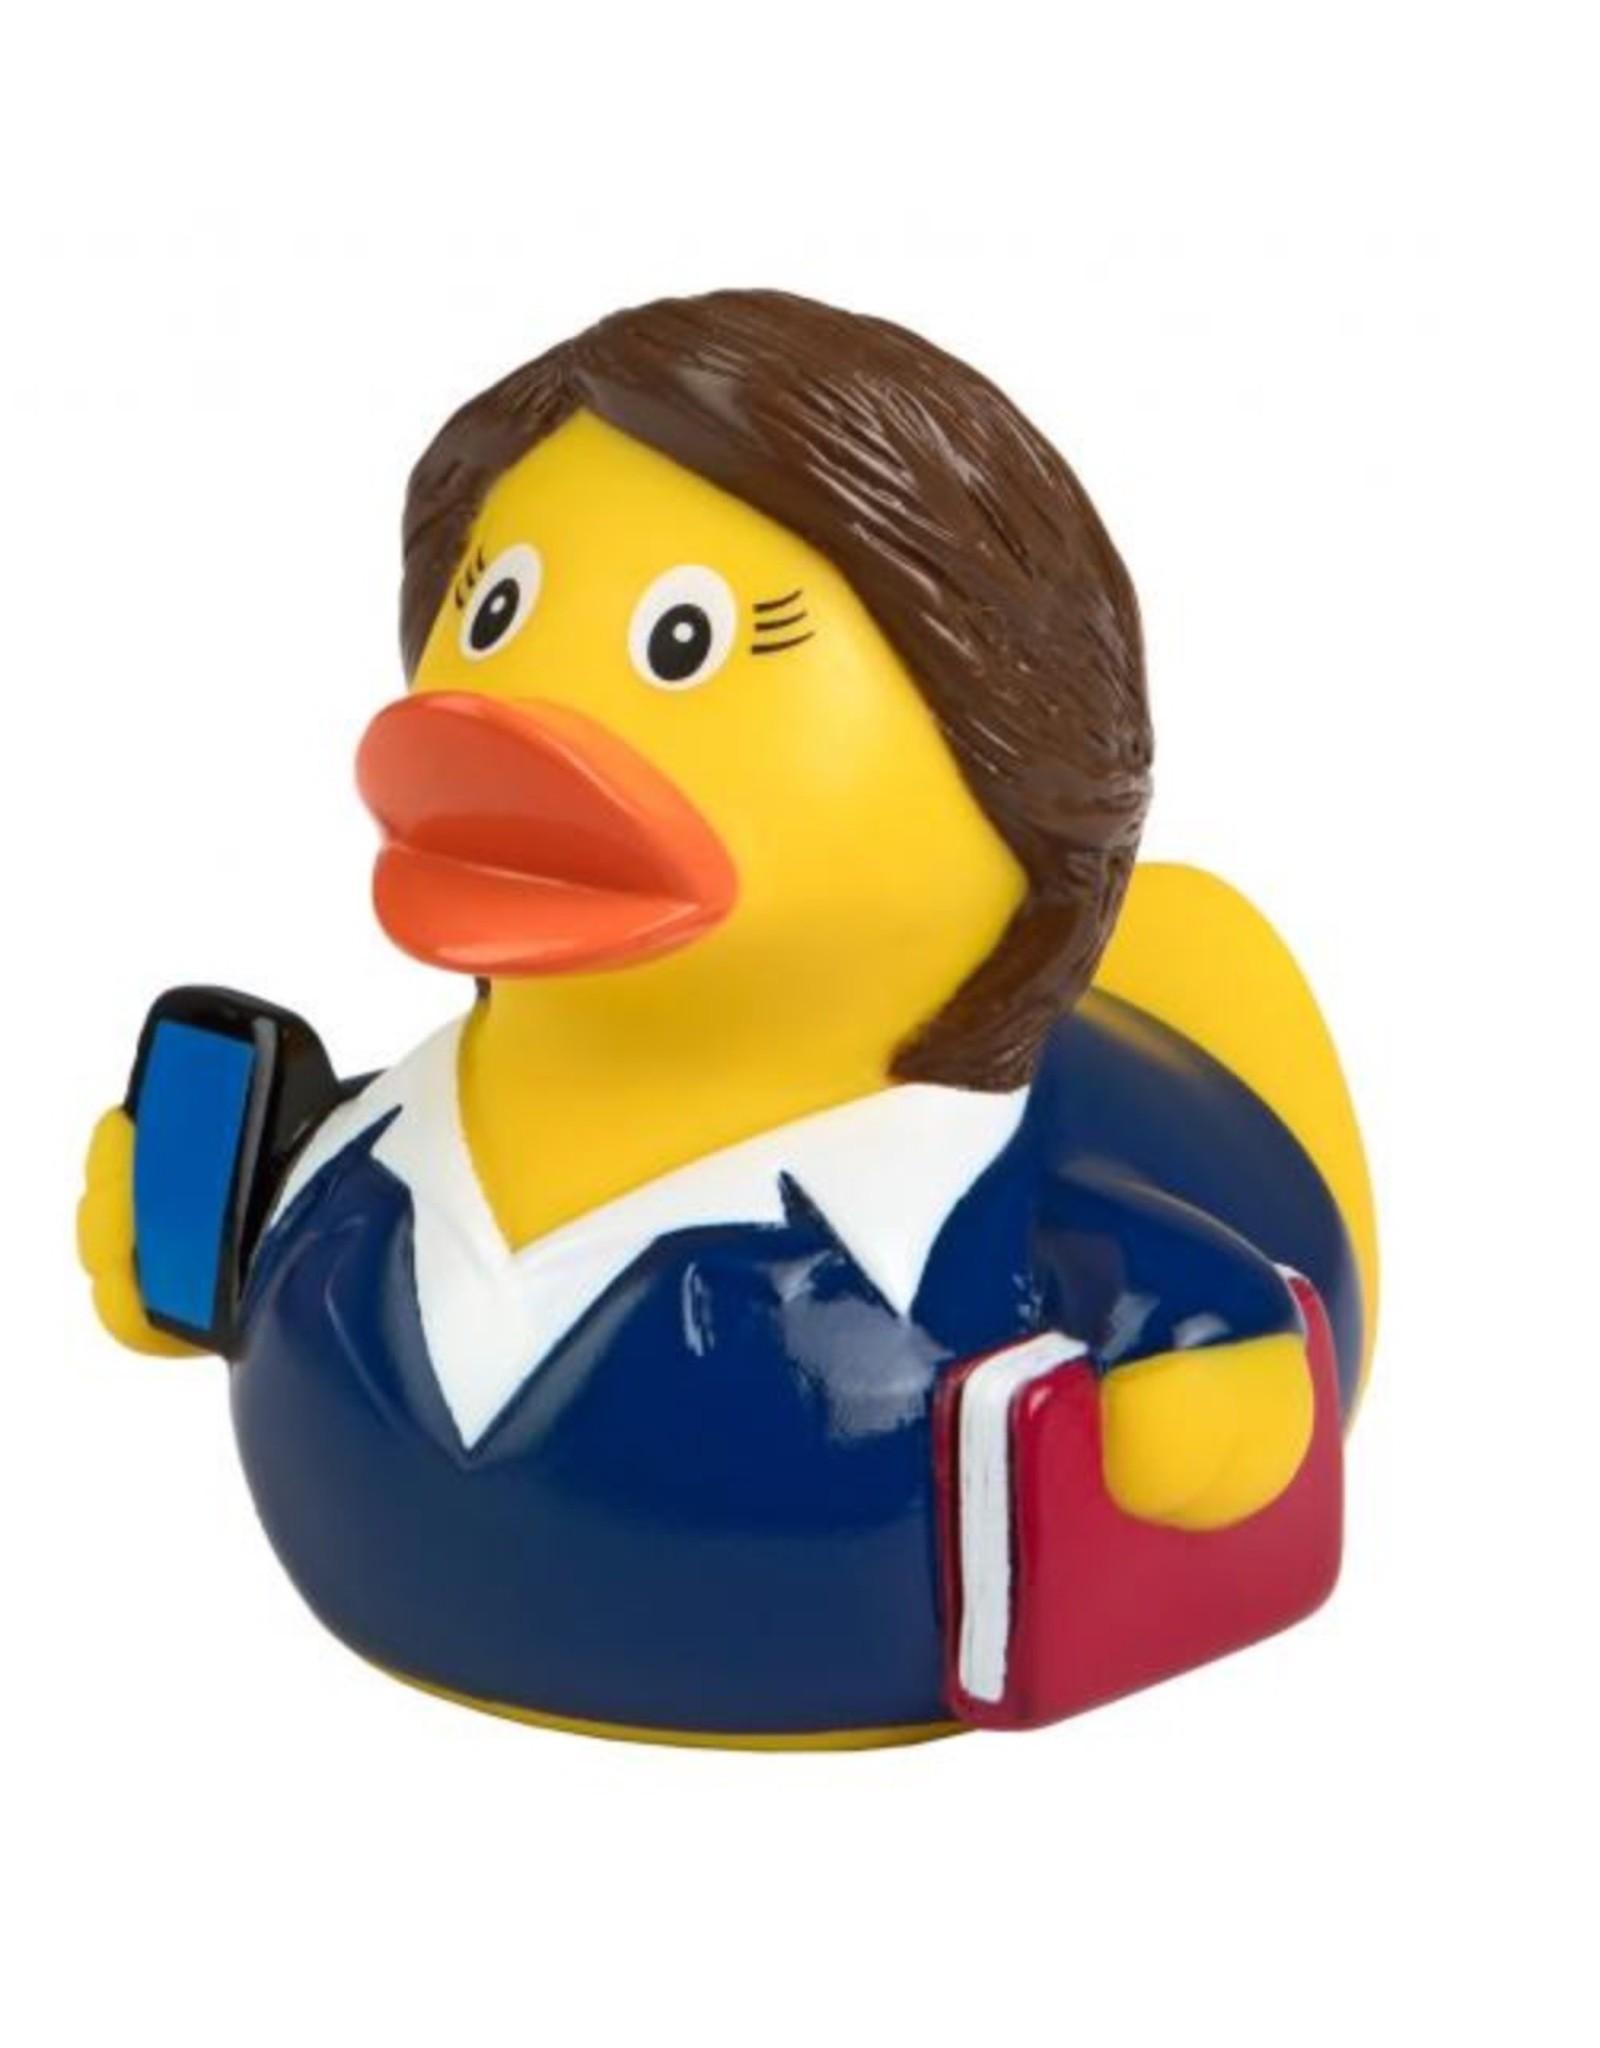 Business Woman Rubber Duck